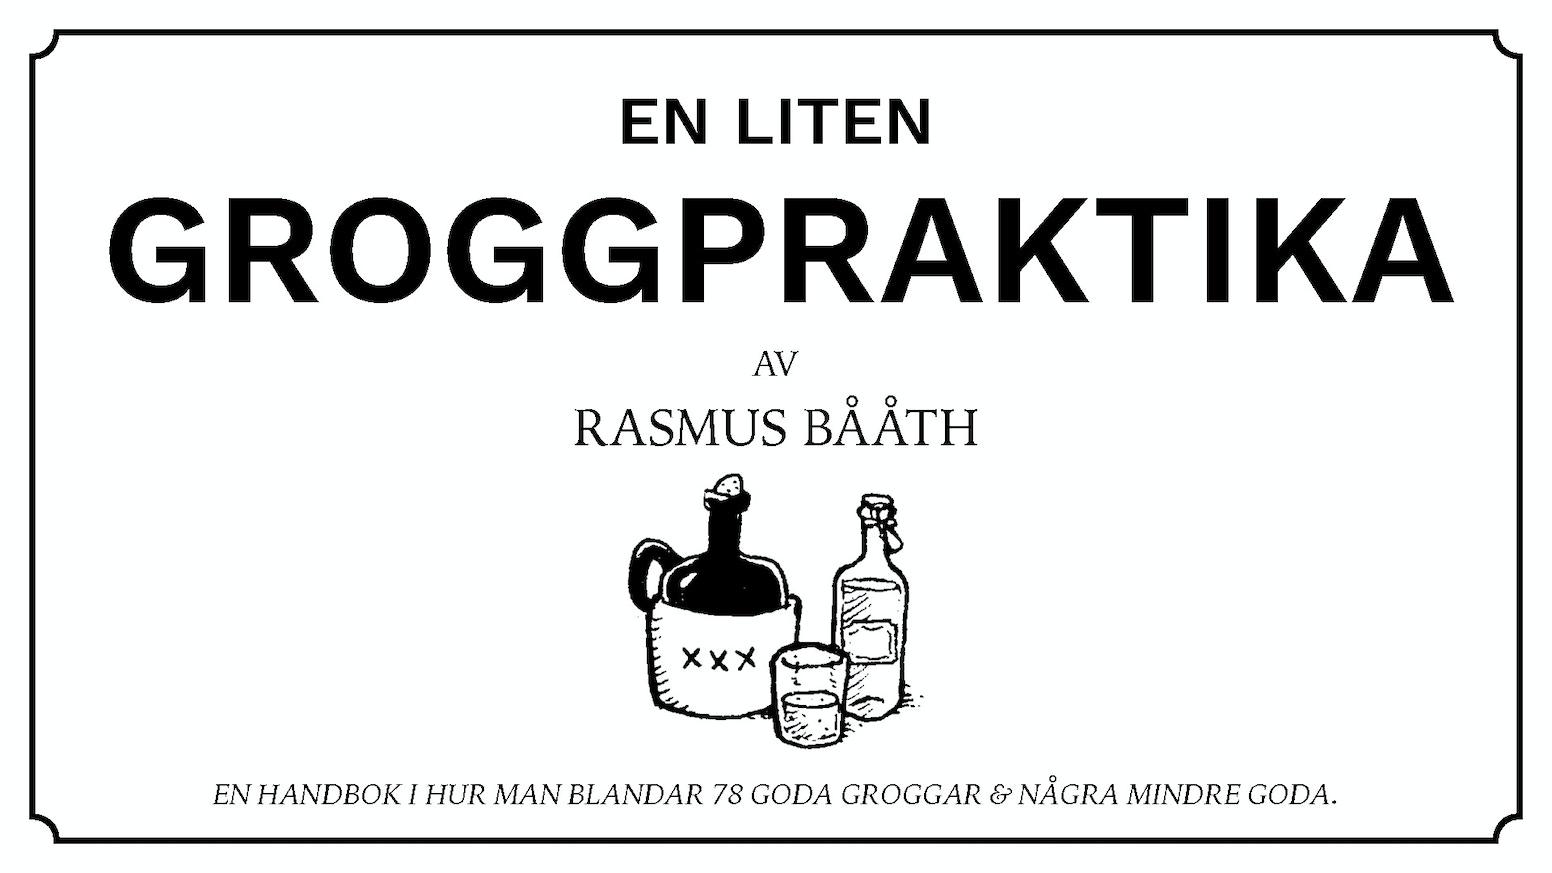 En liten groggpraktika by Rasmus Bååth — Kickstarter